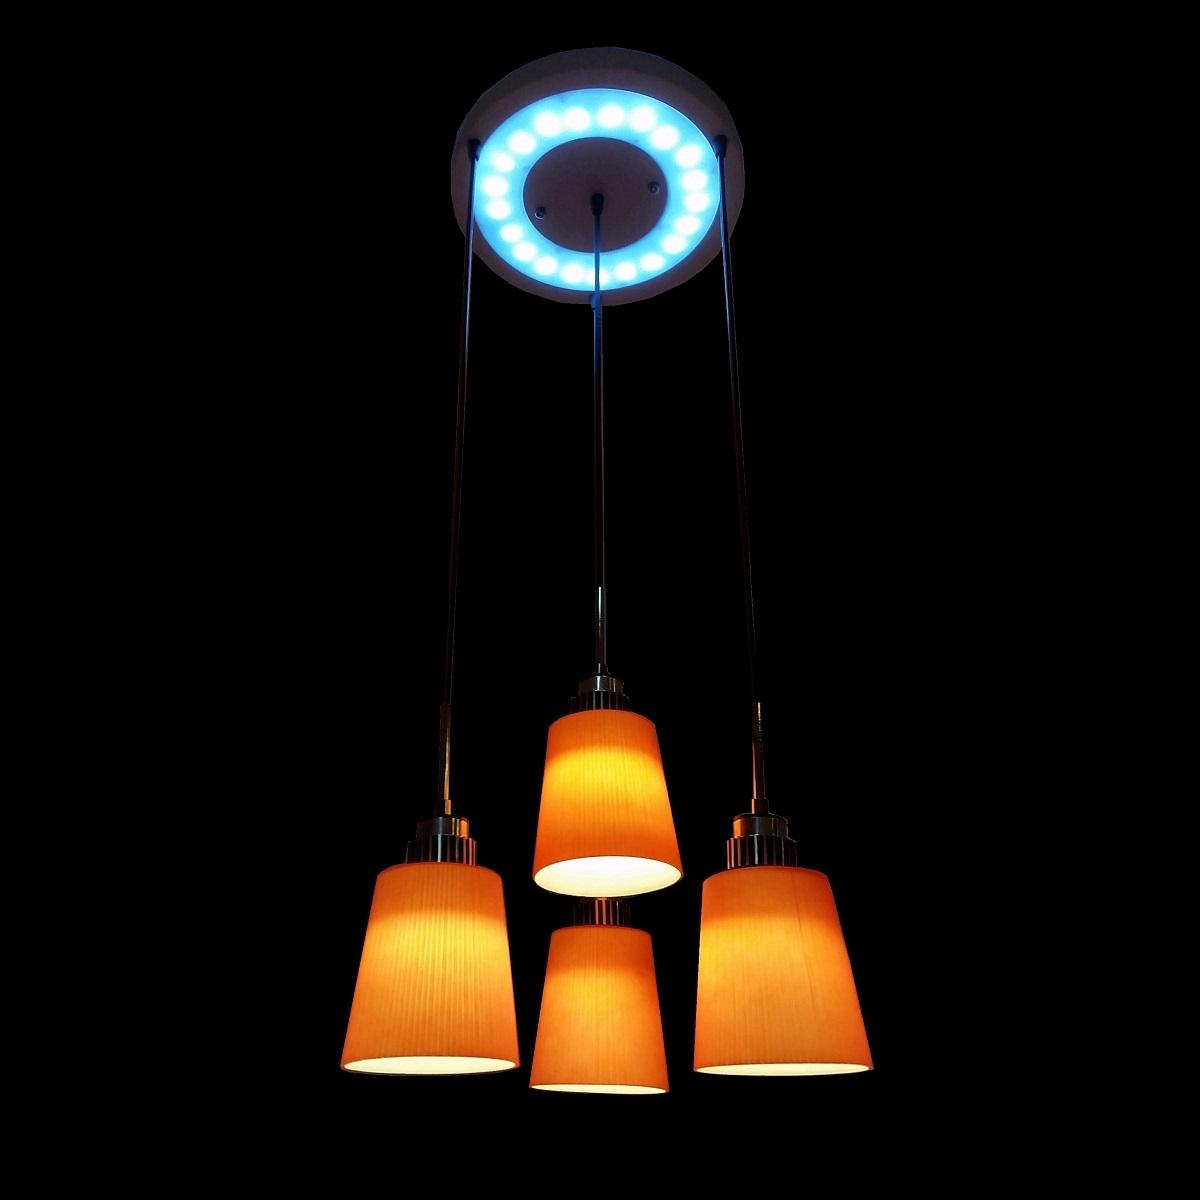 Hanging Lamp Led: 4 Light LED Hanging Pendant Lamp In RED L Brilliant Source